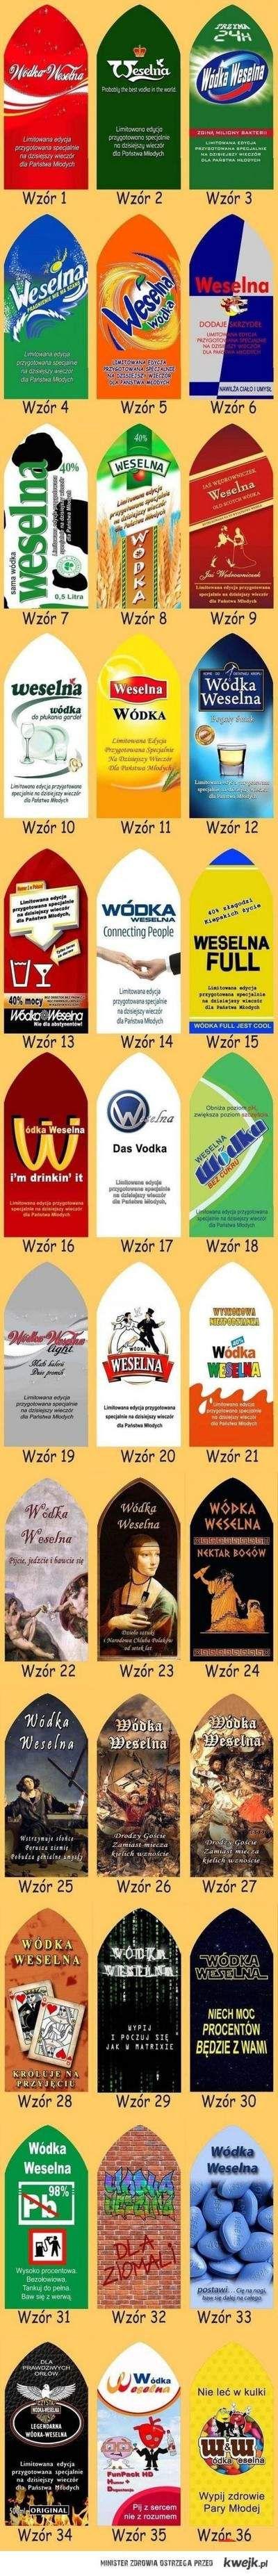 weselna